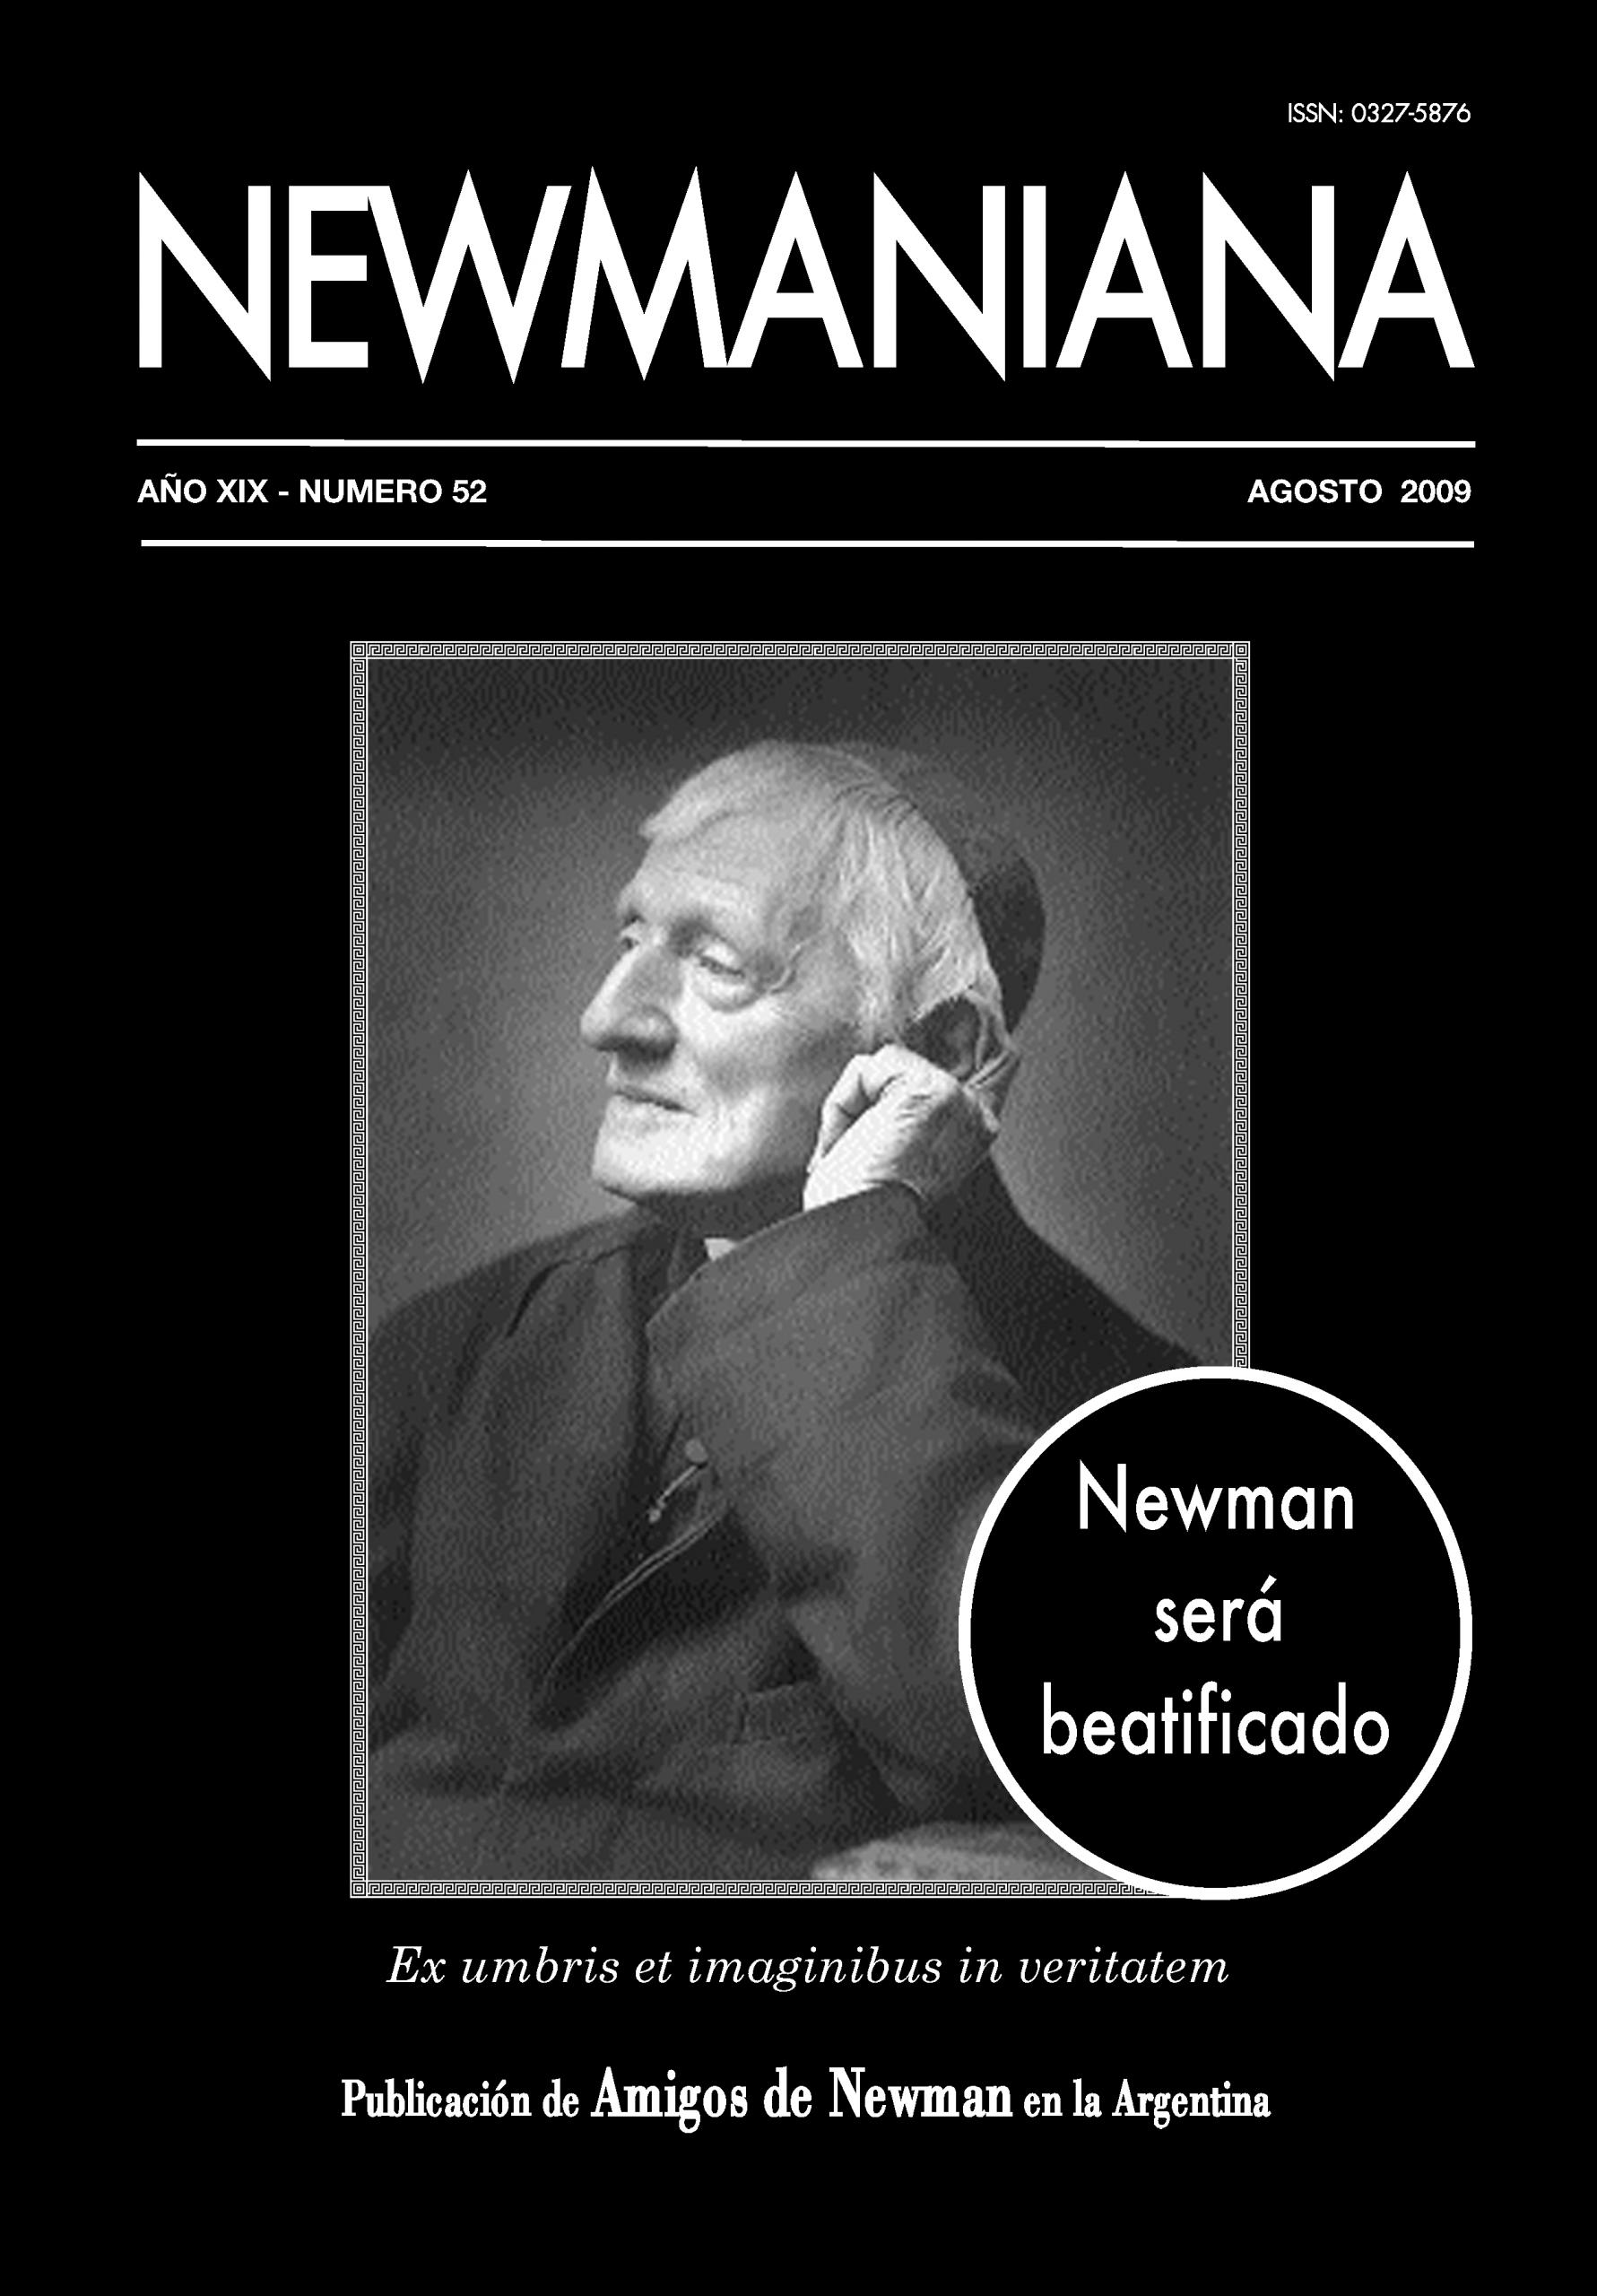 Revista Newmaniana 52 – Agosto 2009